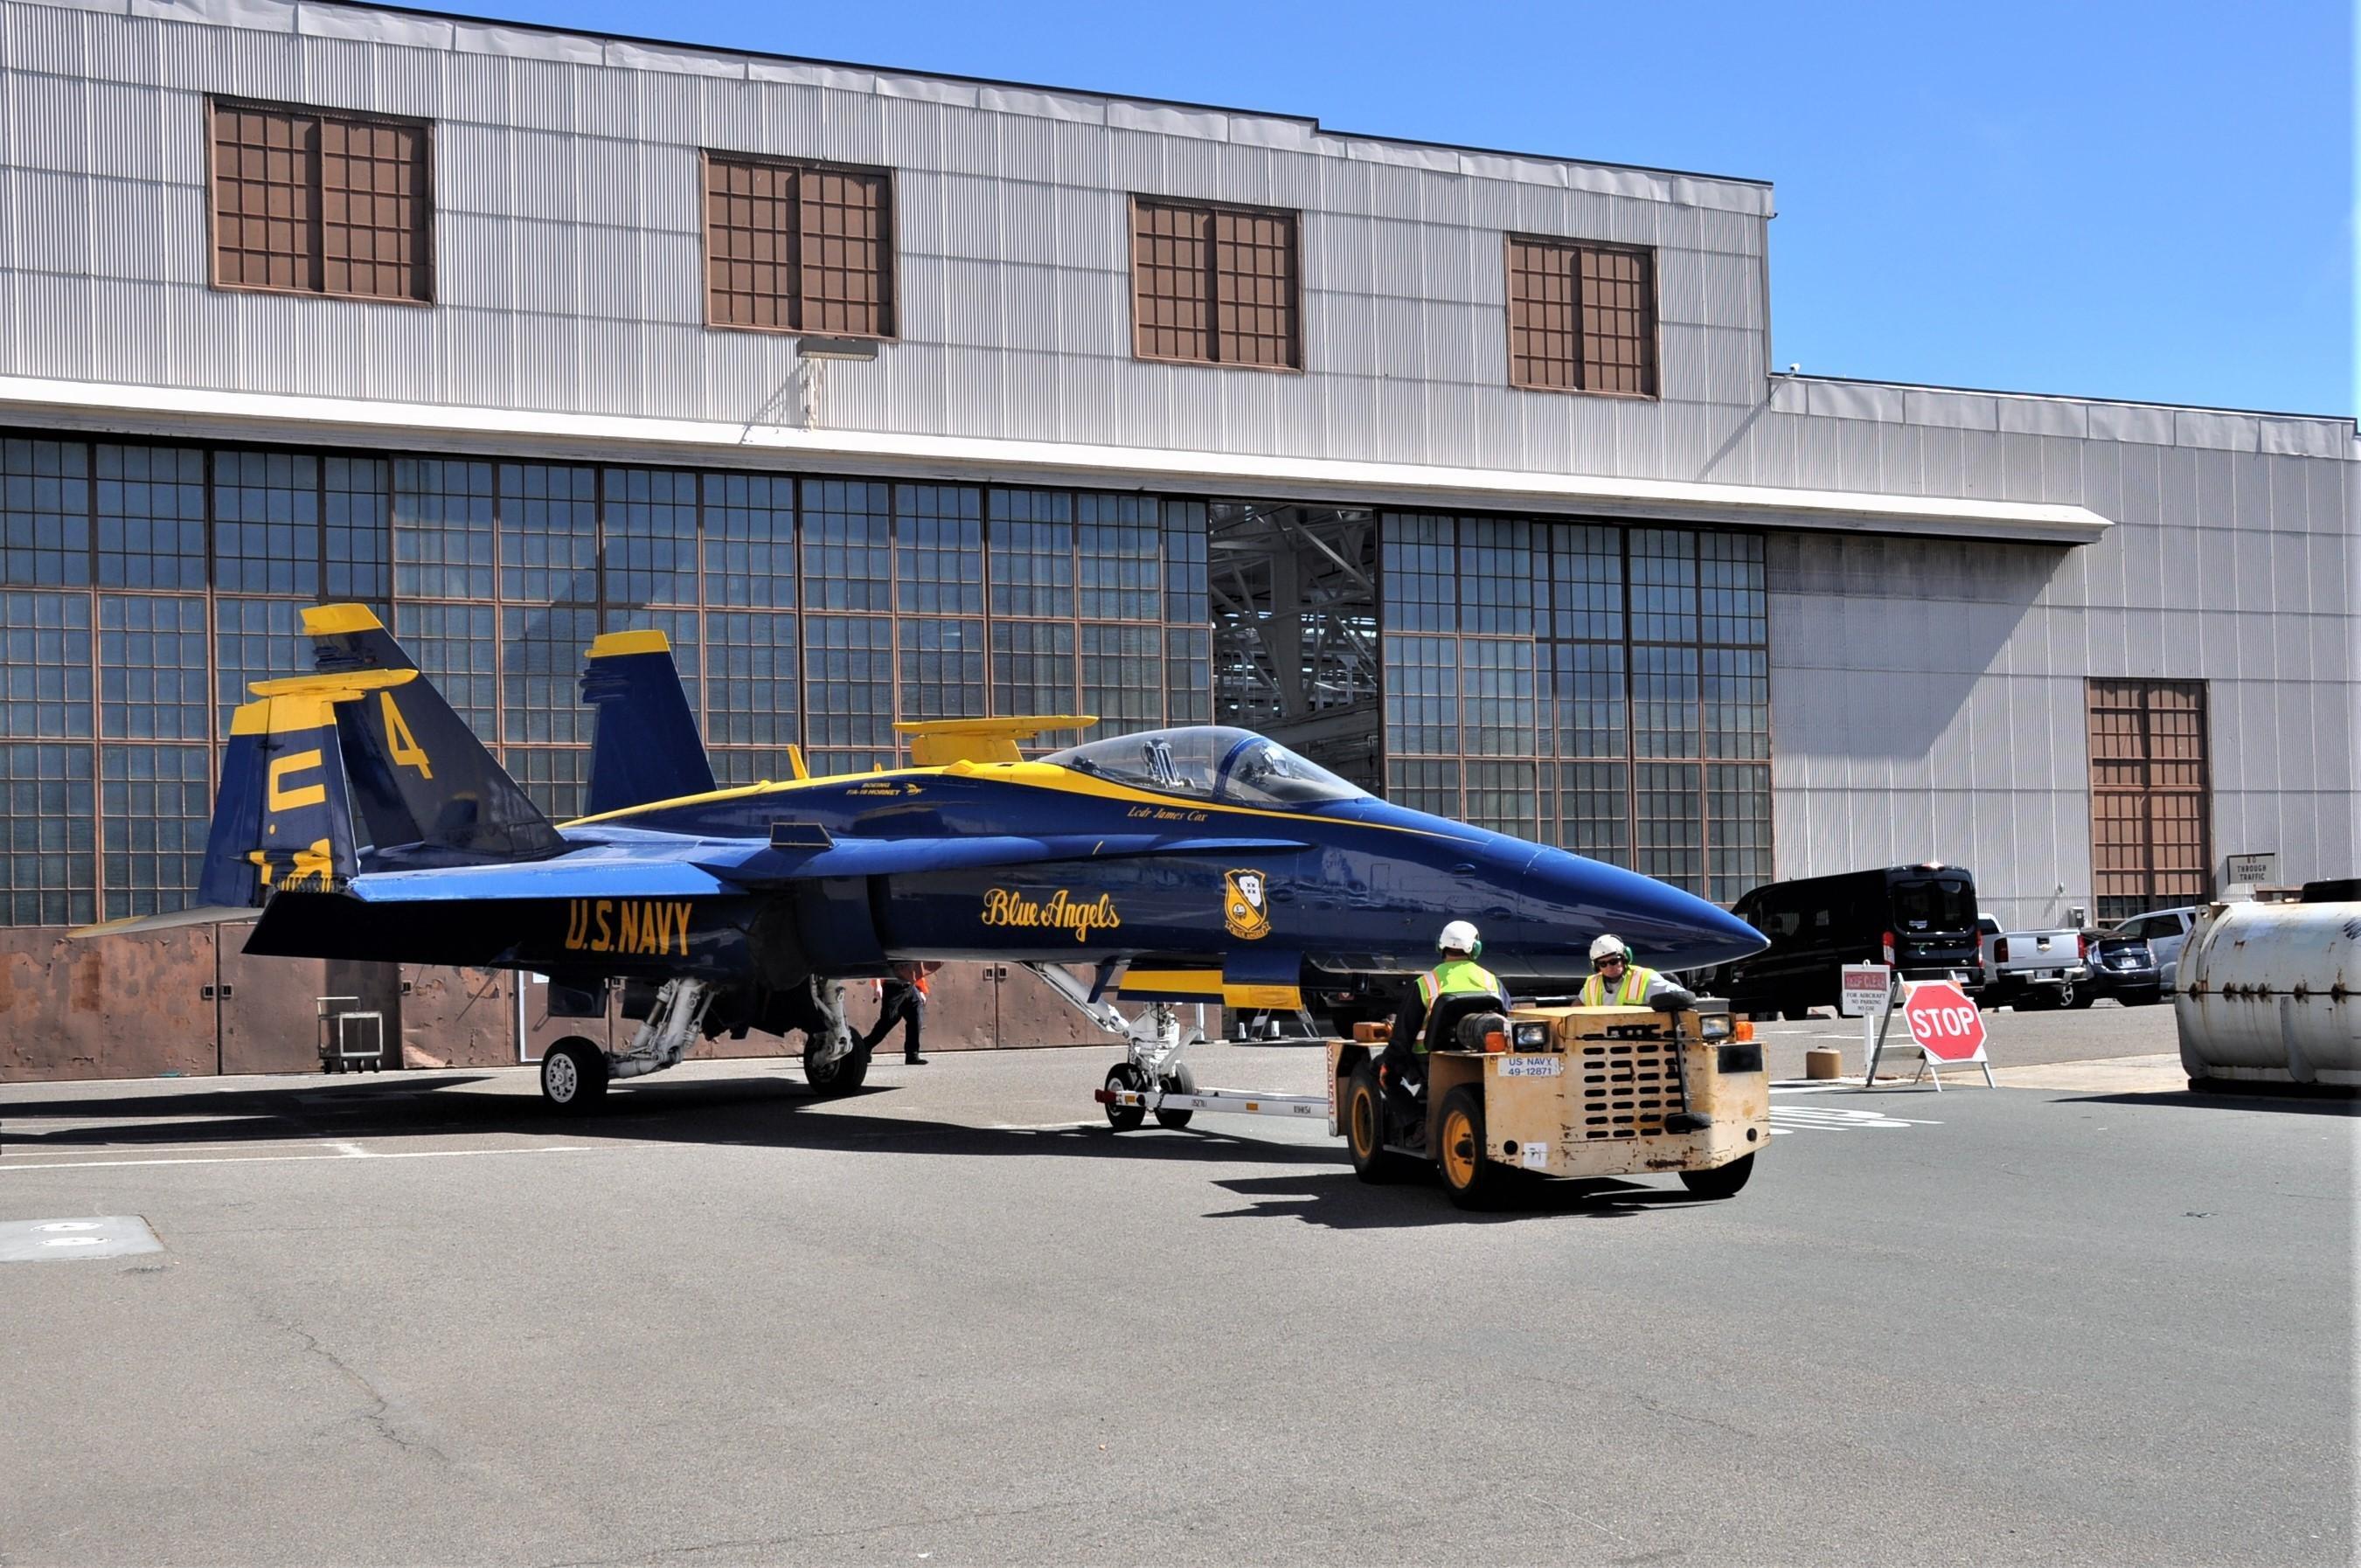 Blue Angels F/A-18C [US Navy]